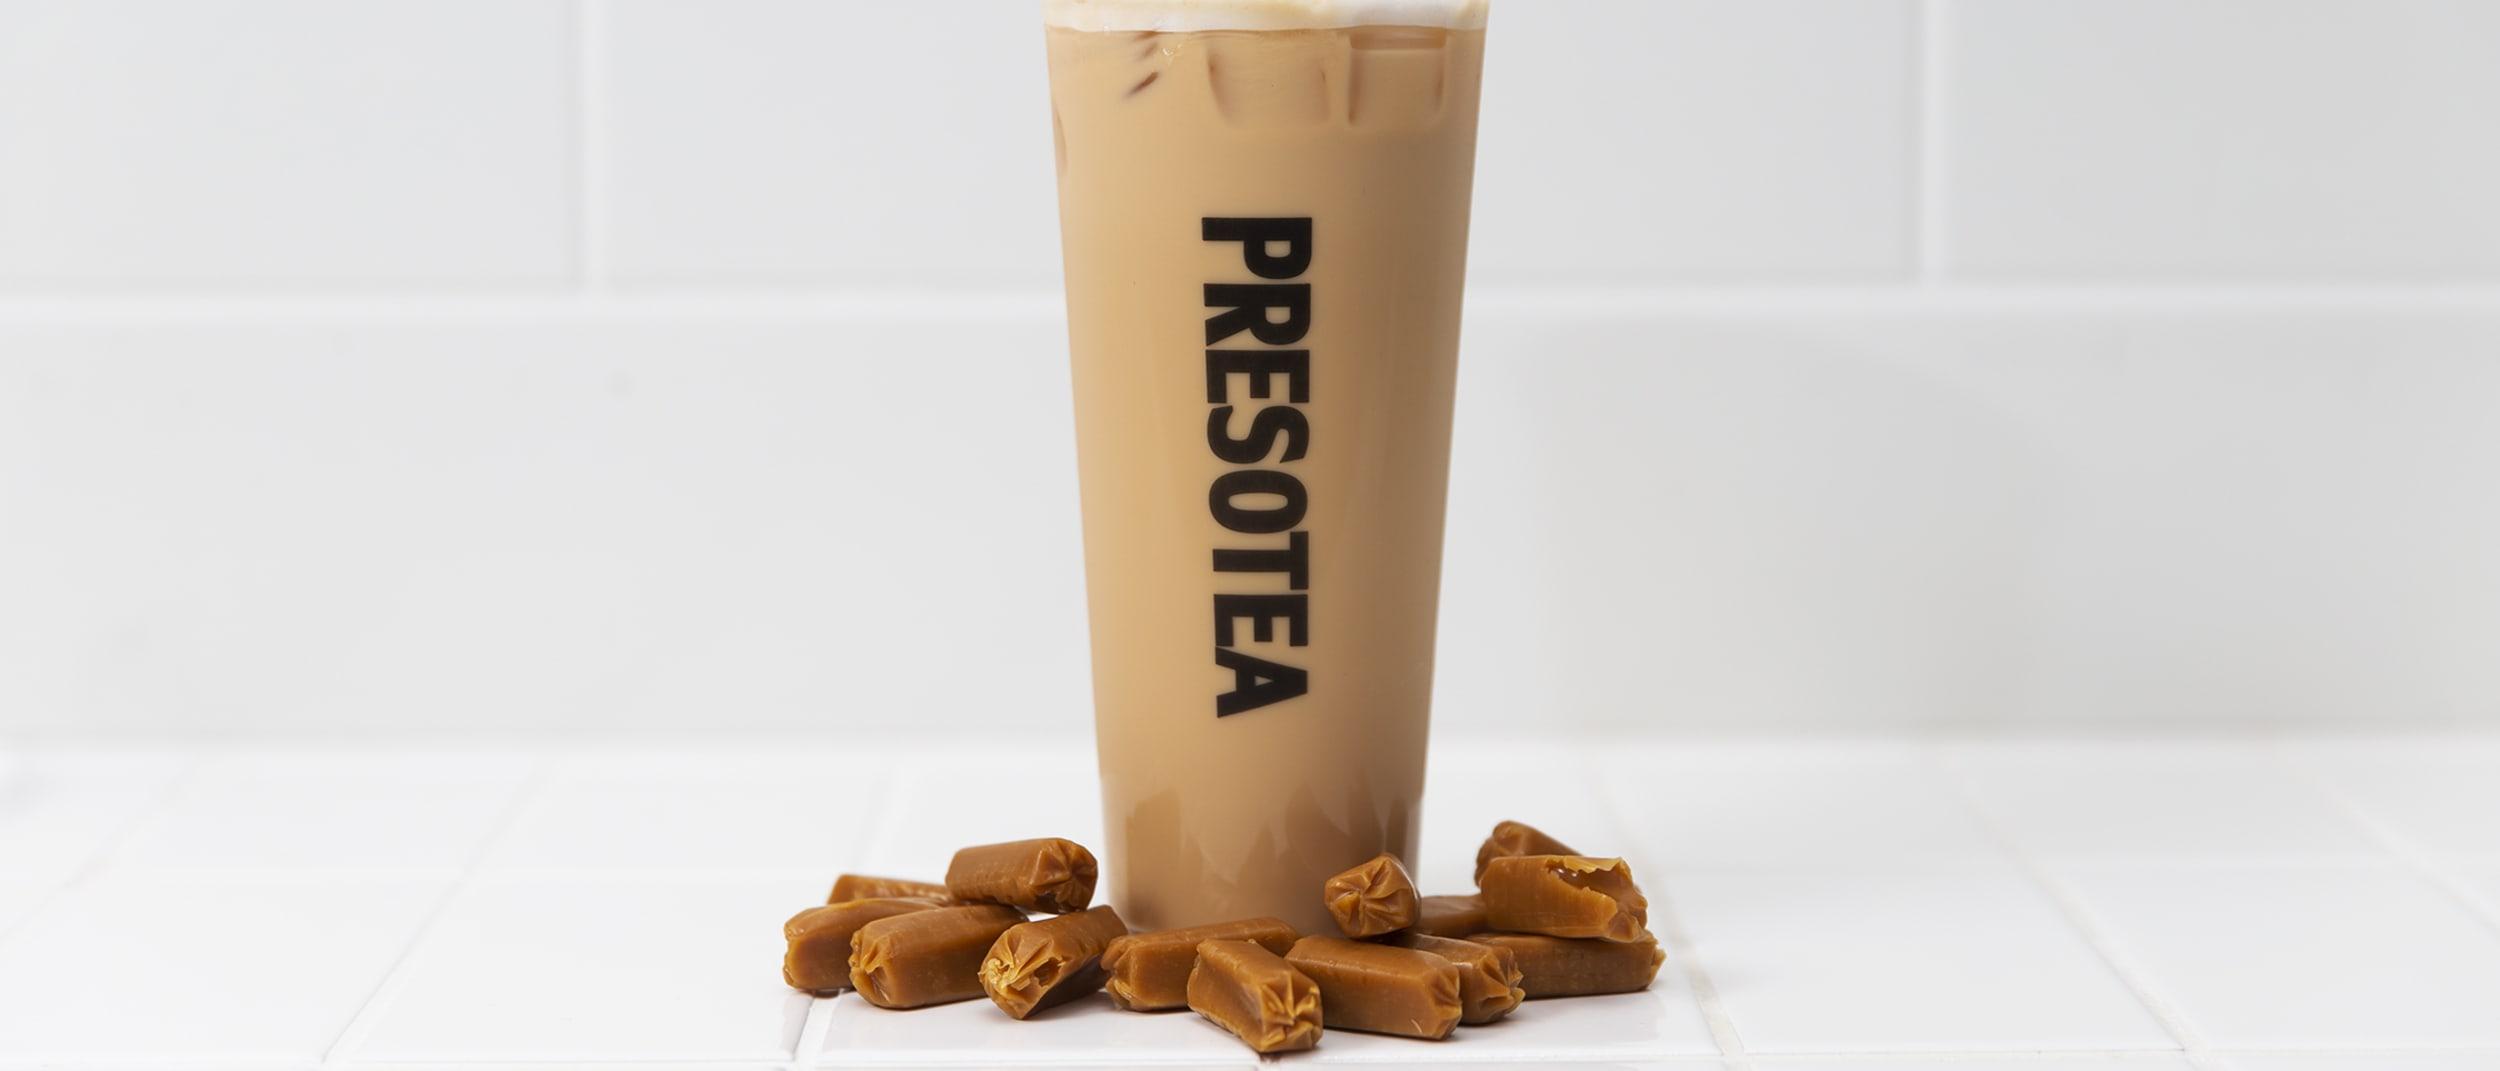 Presotea: new toffee tea range now available